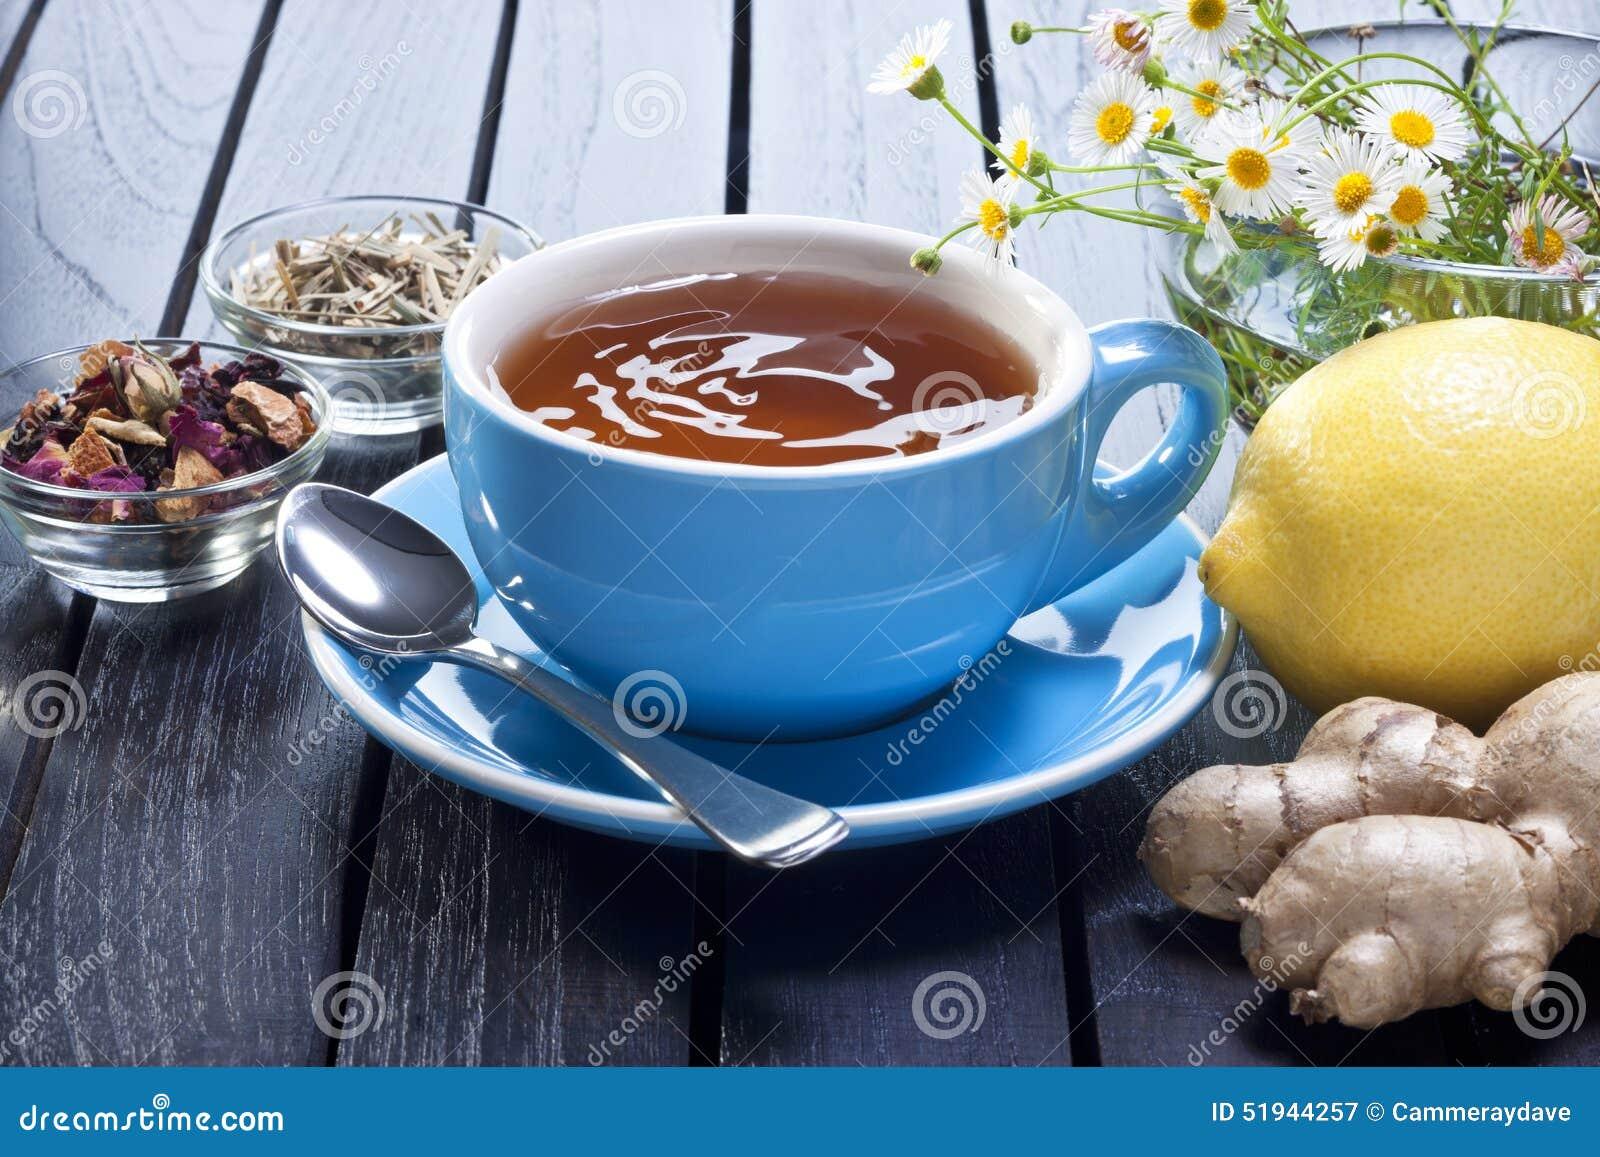 Lemon Detox Ginger Tea Cup